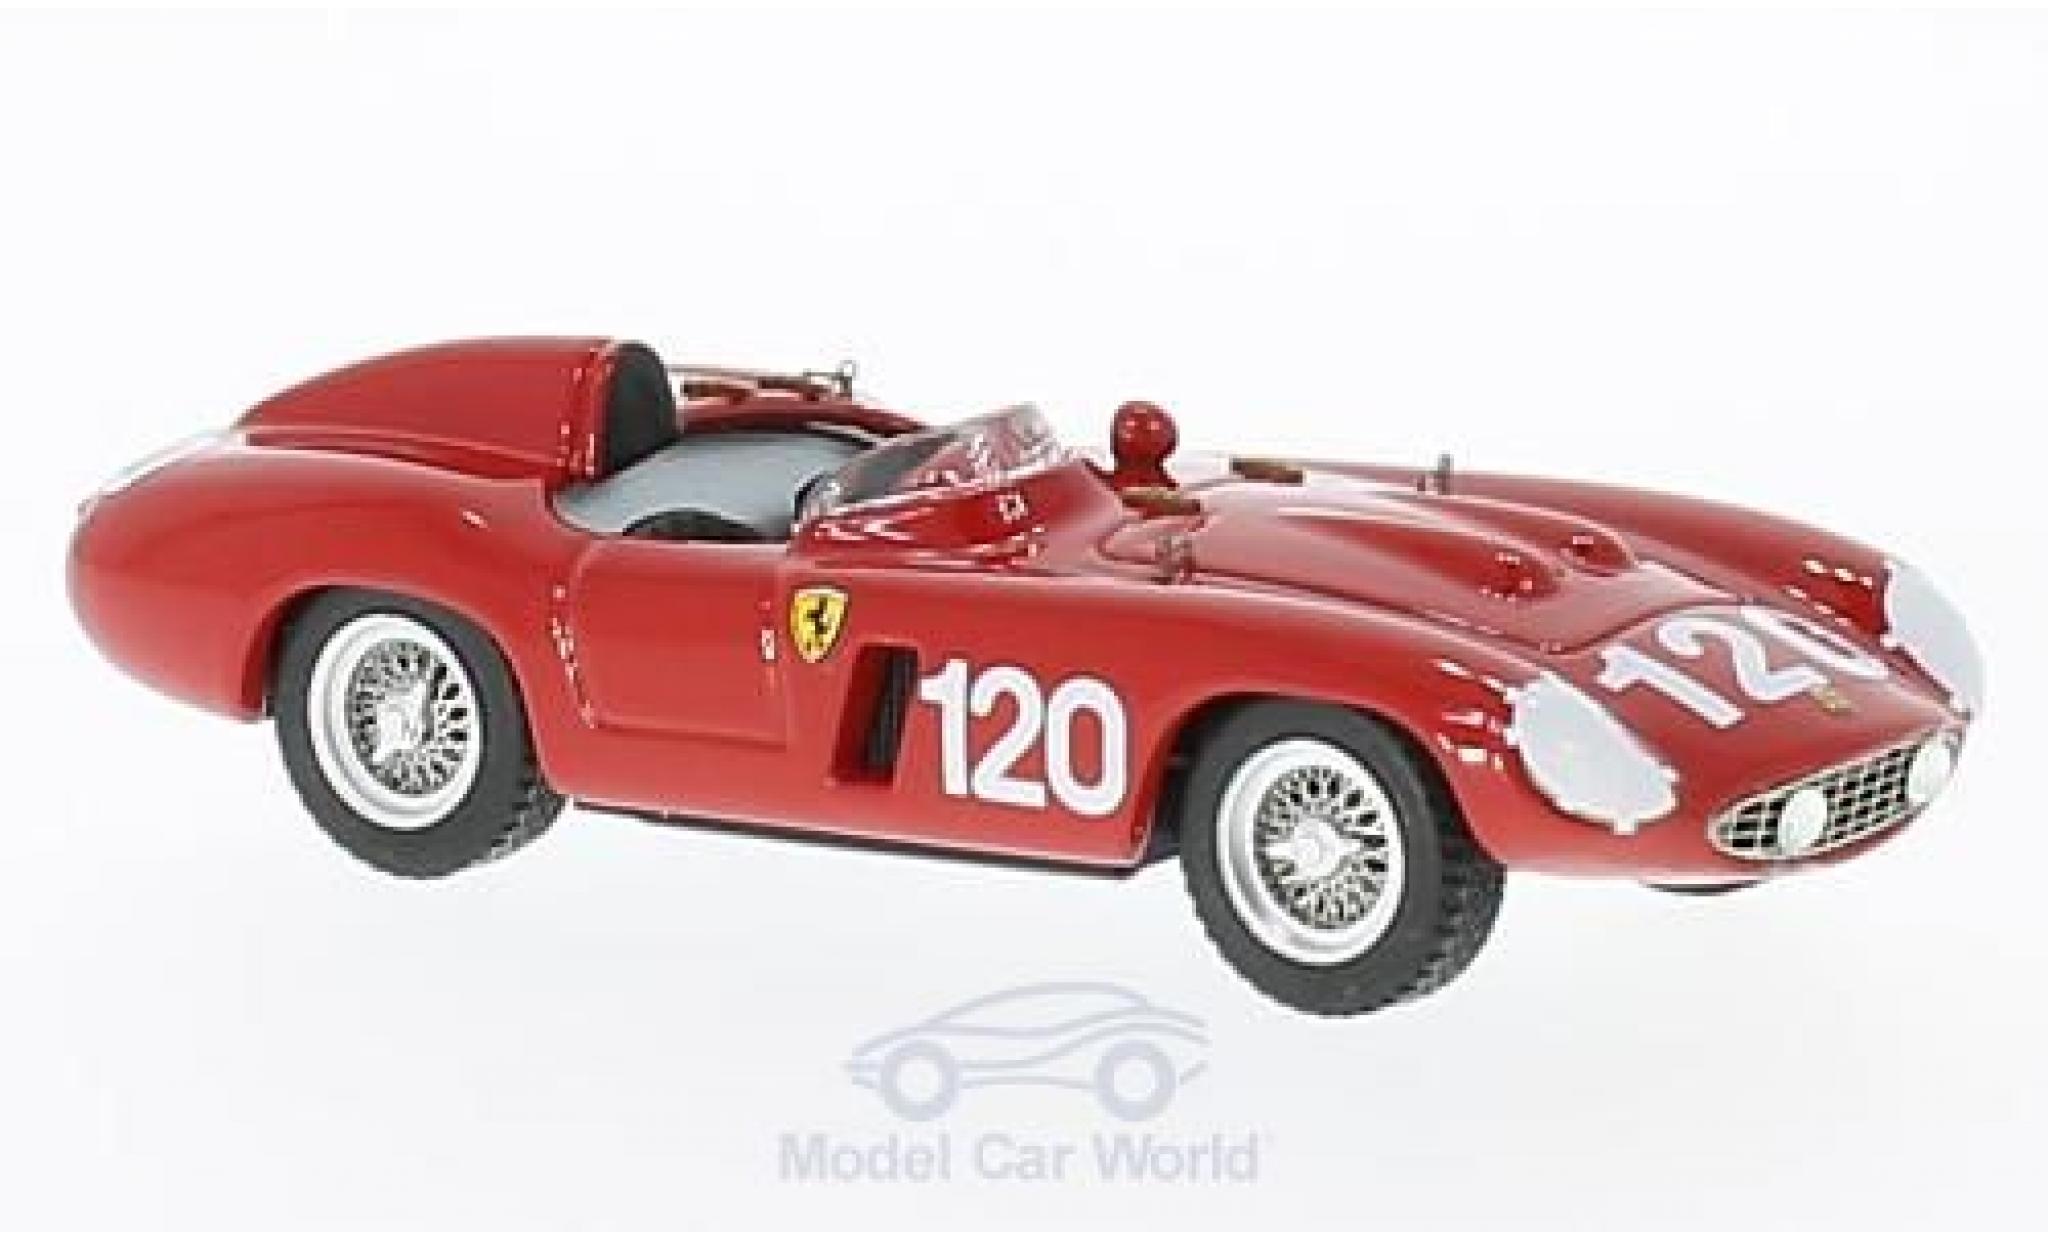 Ferrari 750 1955 1/43 Art Model Monza RHD No.120 Targa Florio U.Maglioli/S.Sighinolfi